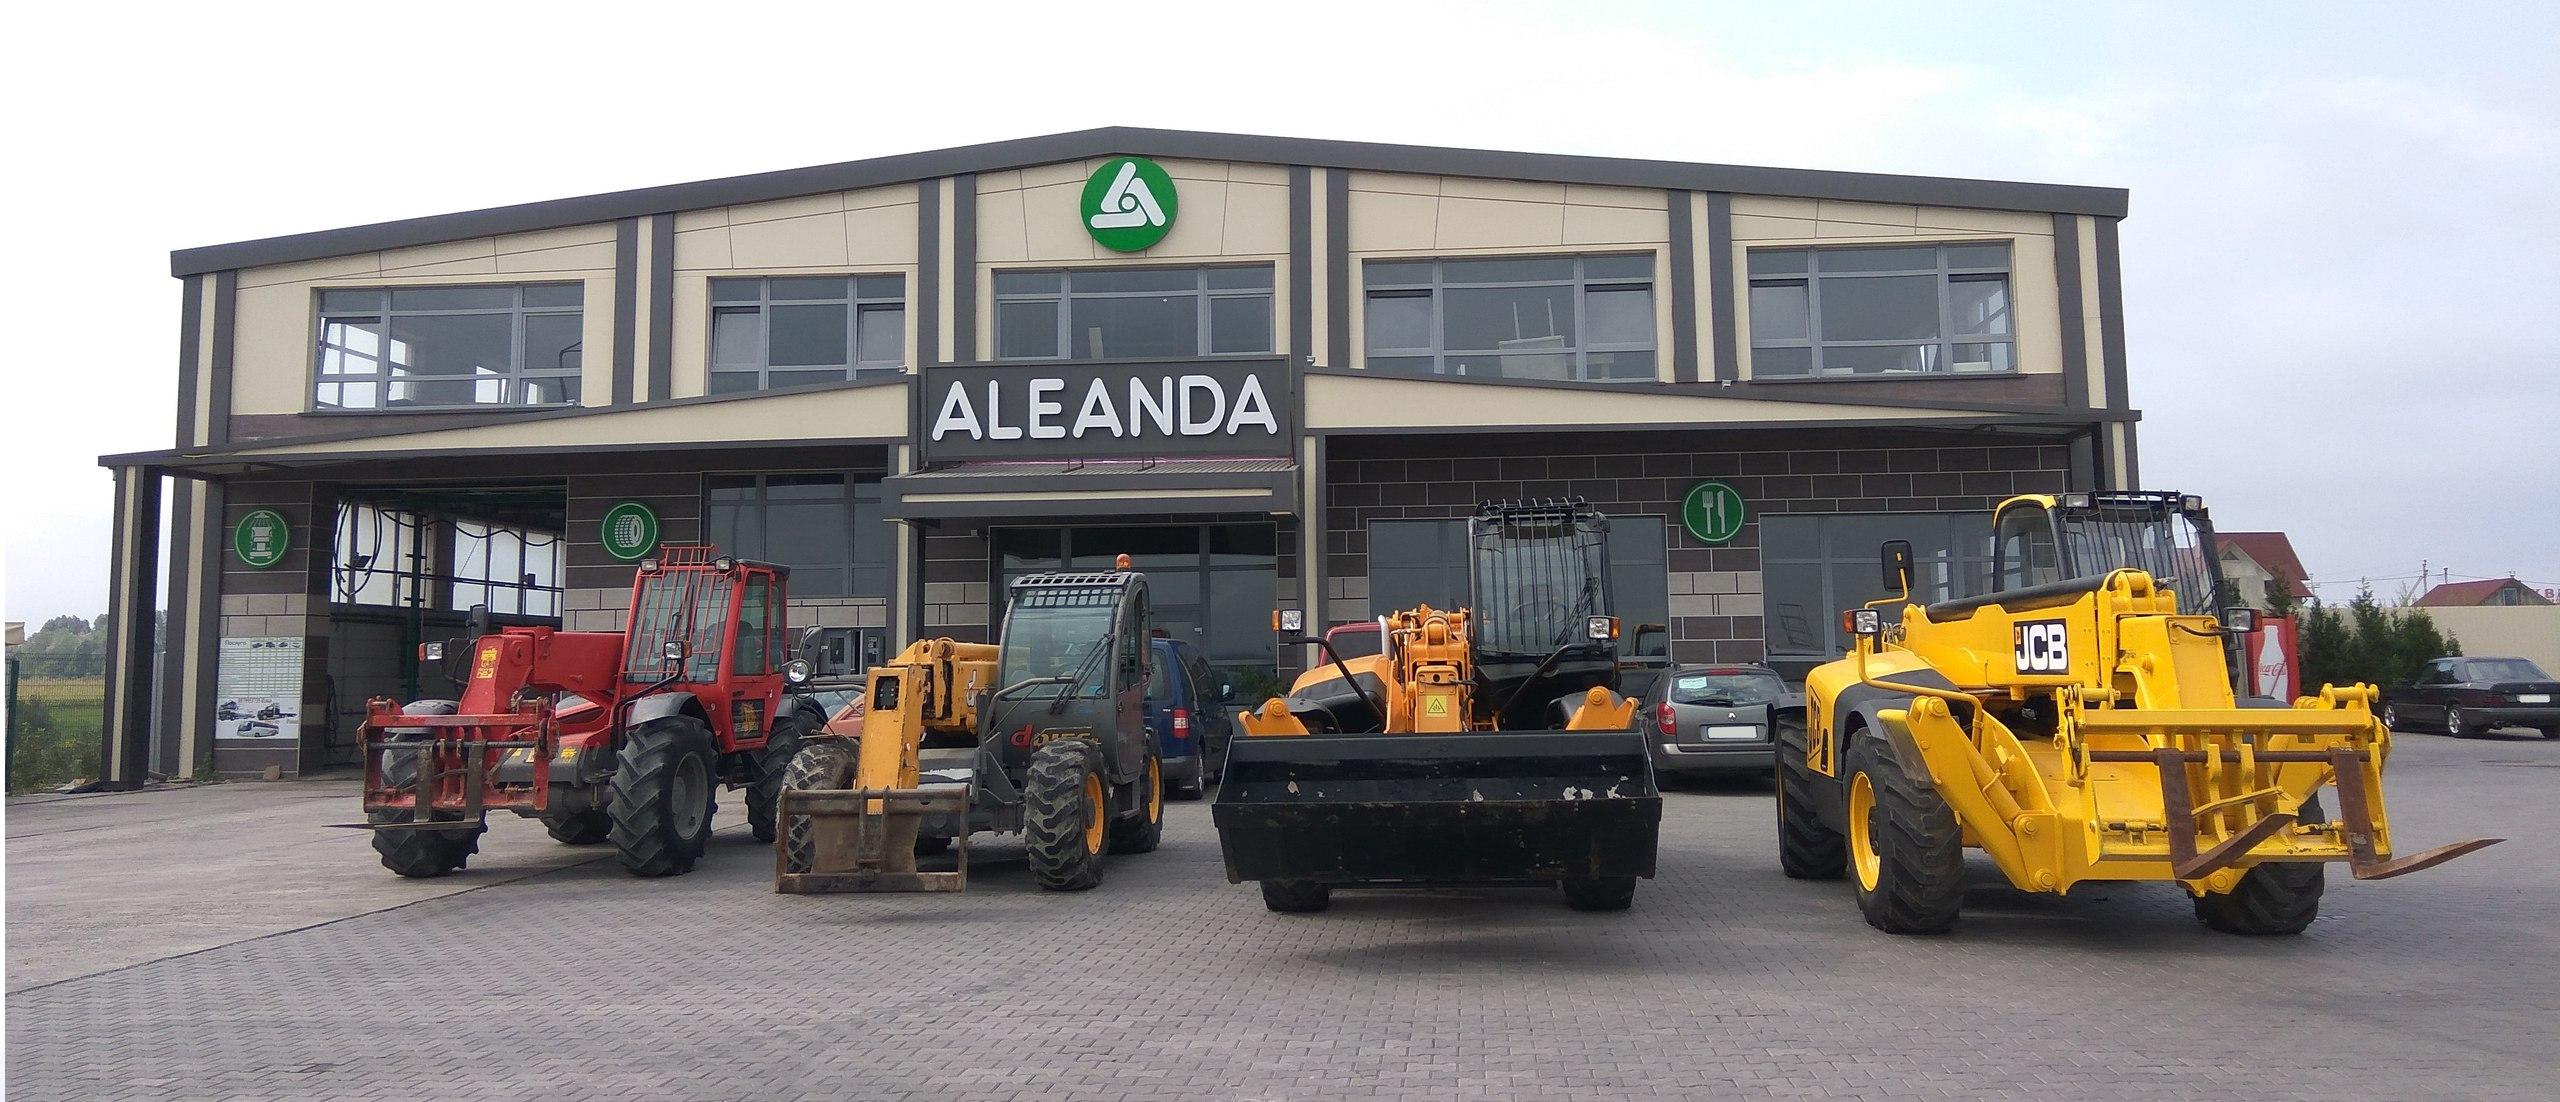 Алеанда - О Компании